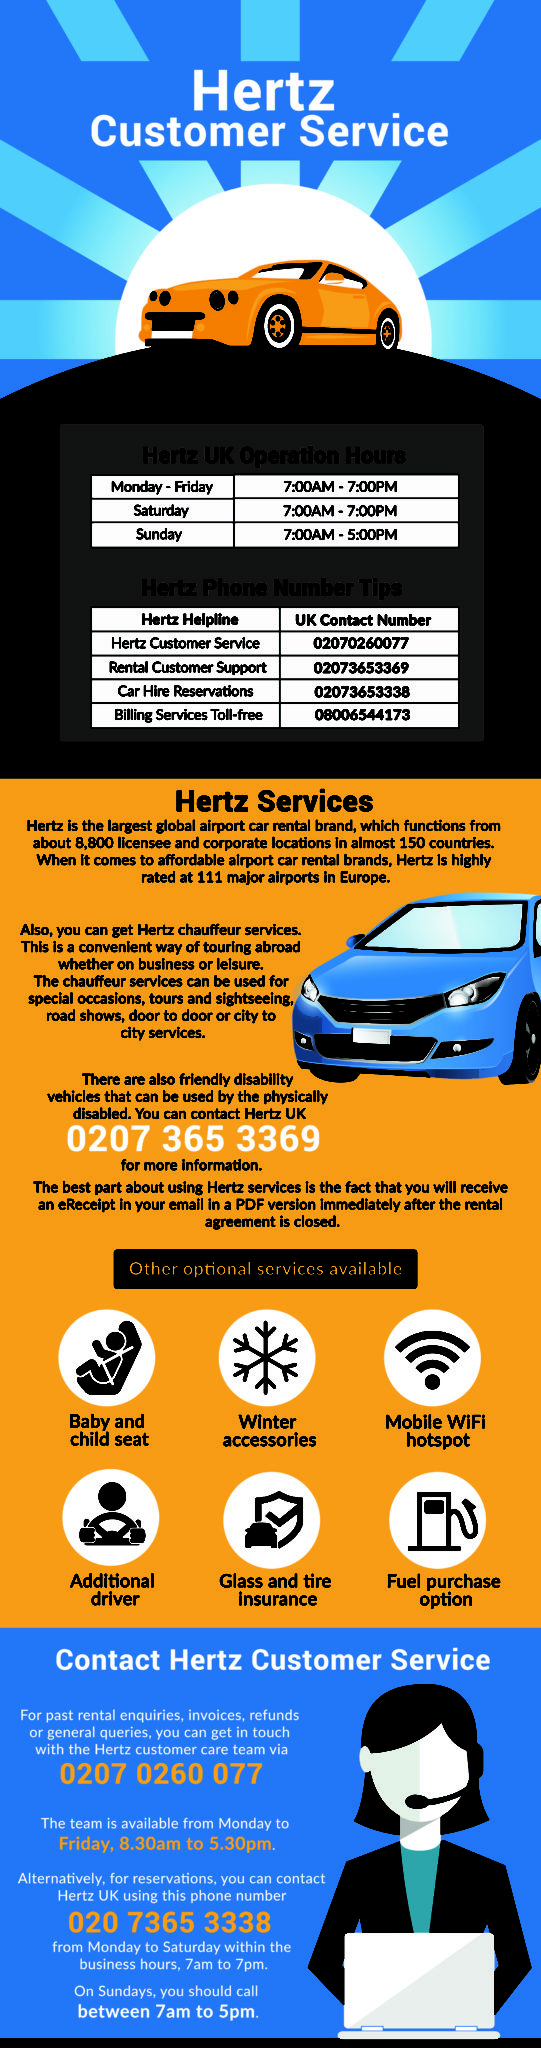 Hertz Customer Service